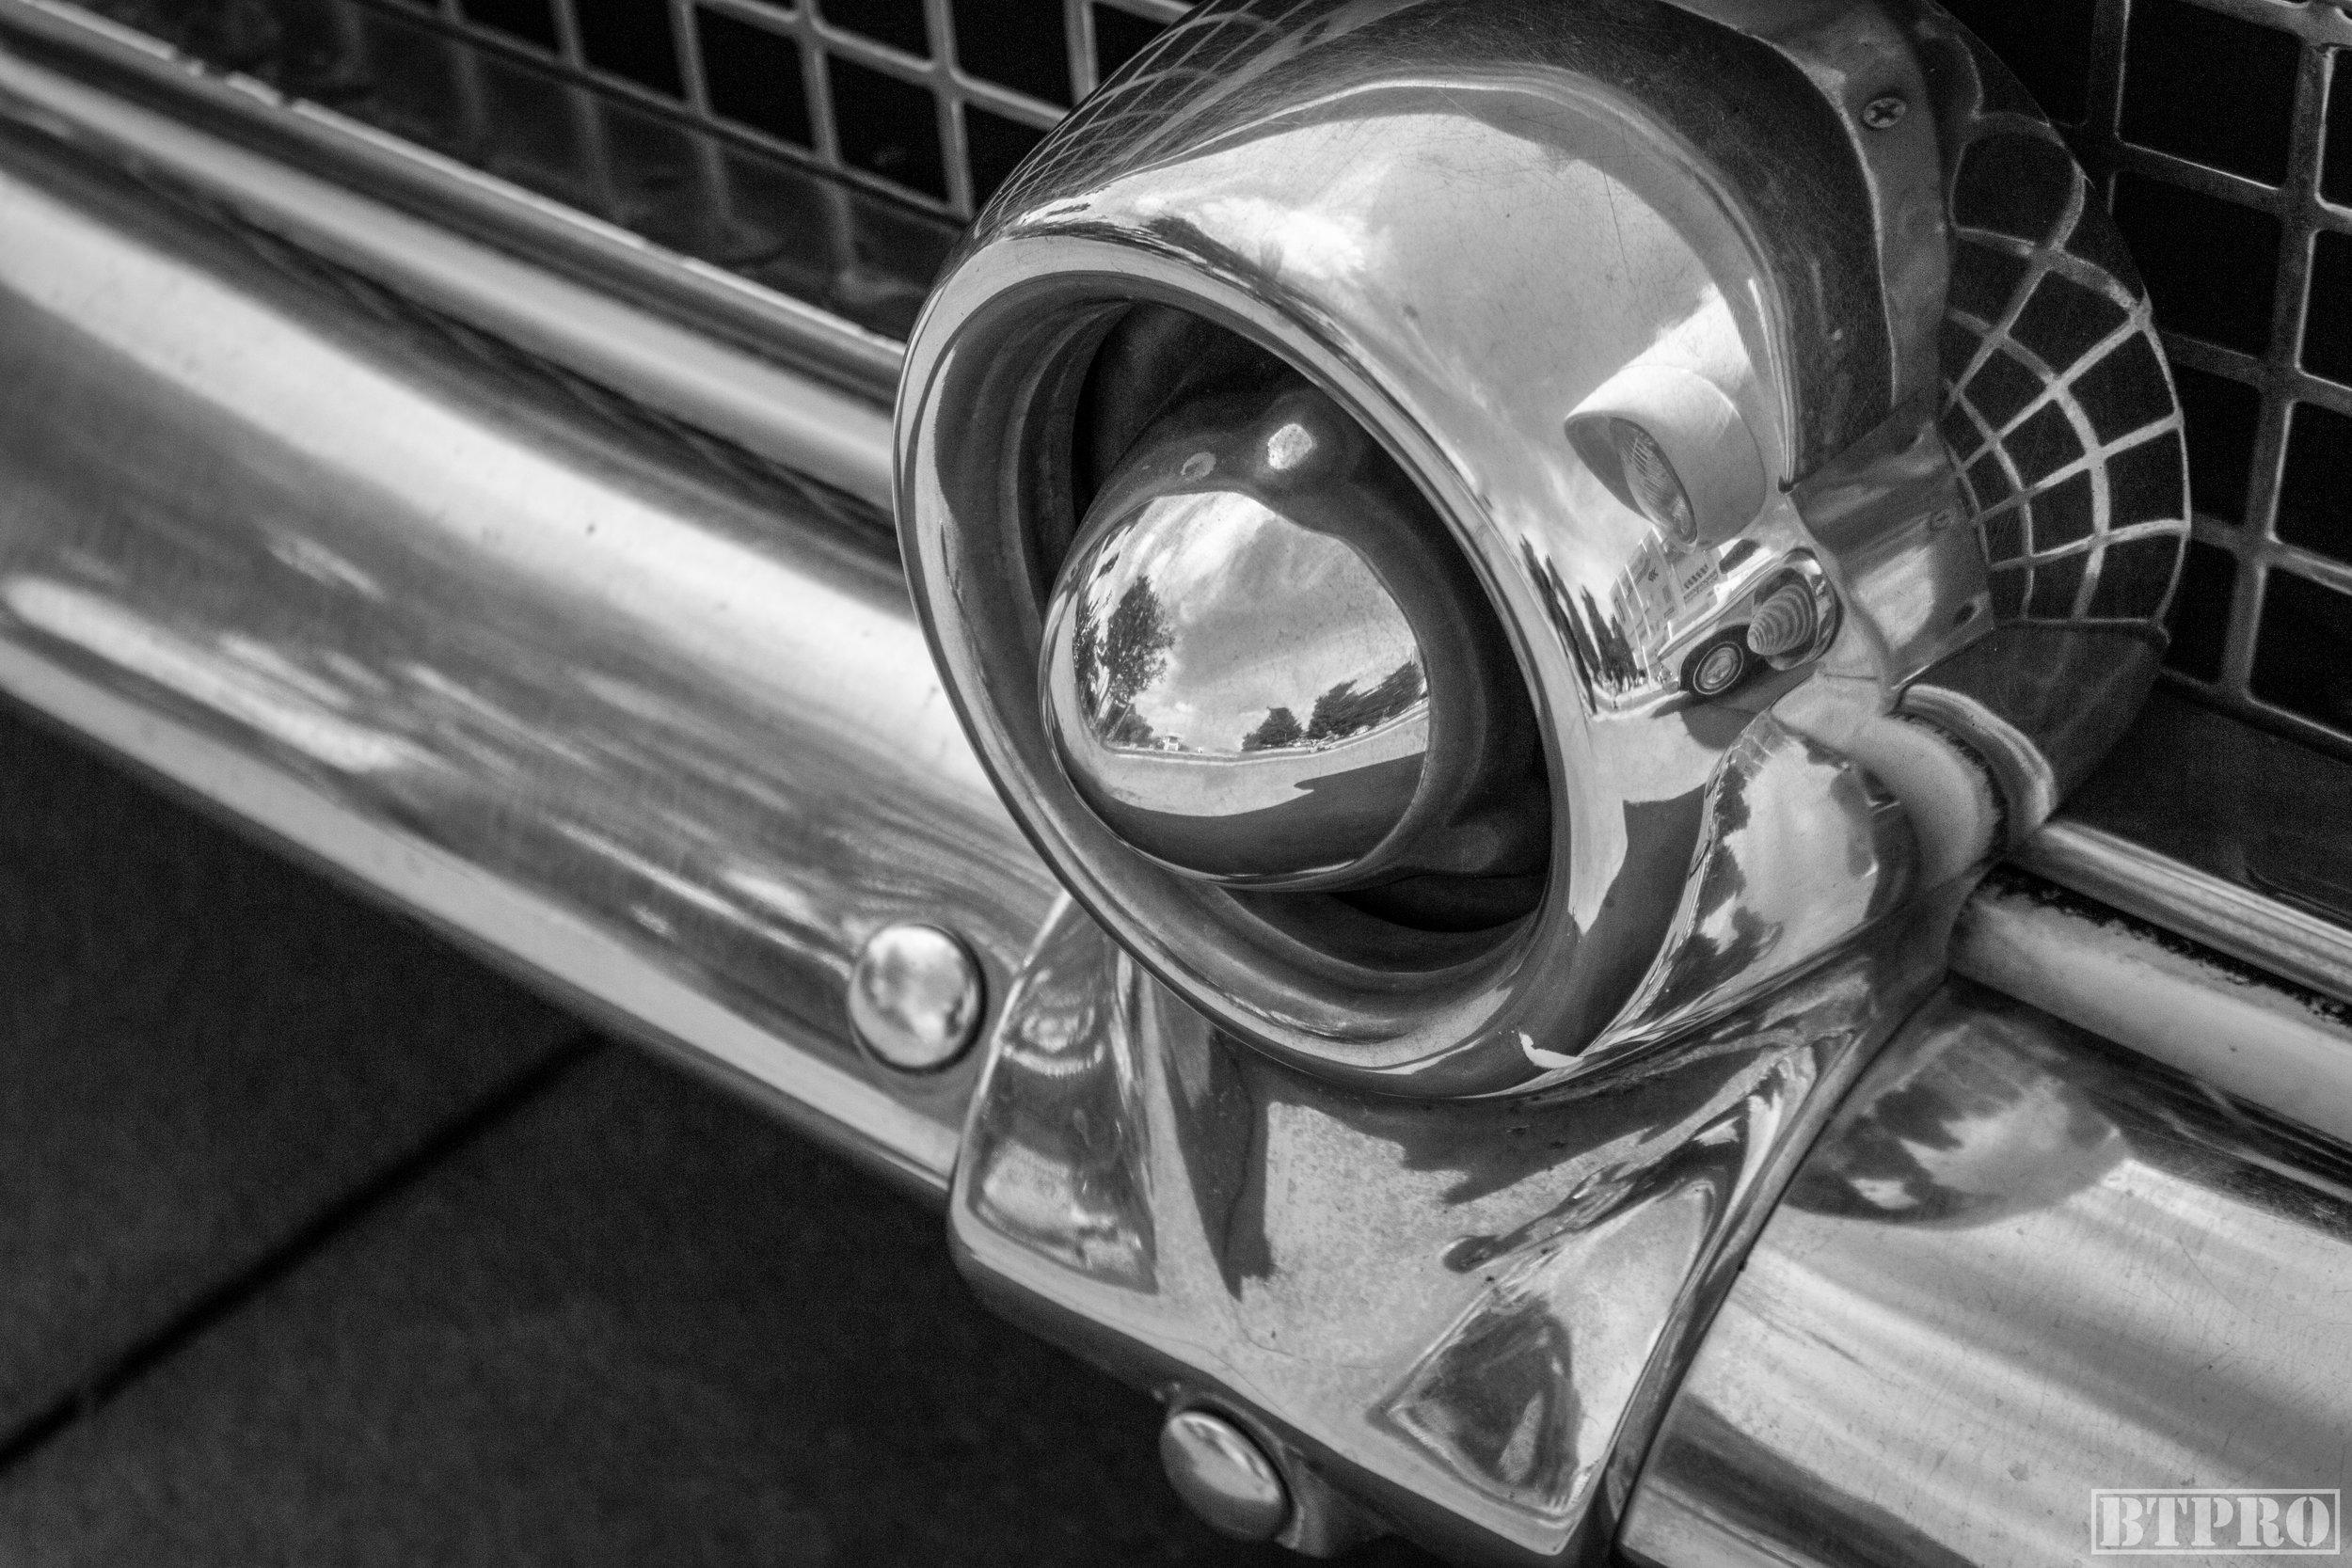 thunderbird, ford thunderbird, 1st generation, car, car photography, vintage car, auto, auto sports, vintage auto, ford, vintage ford